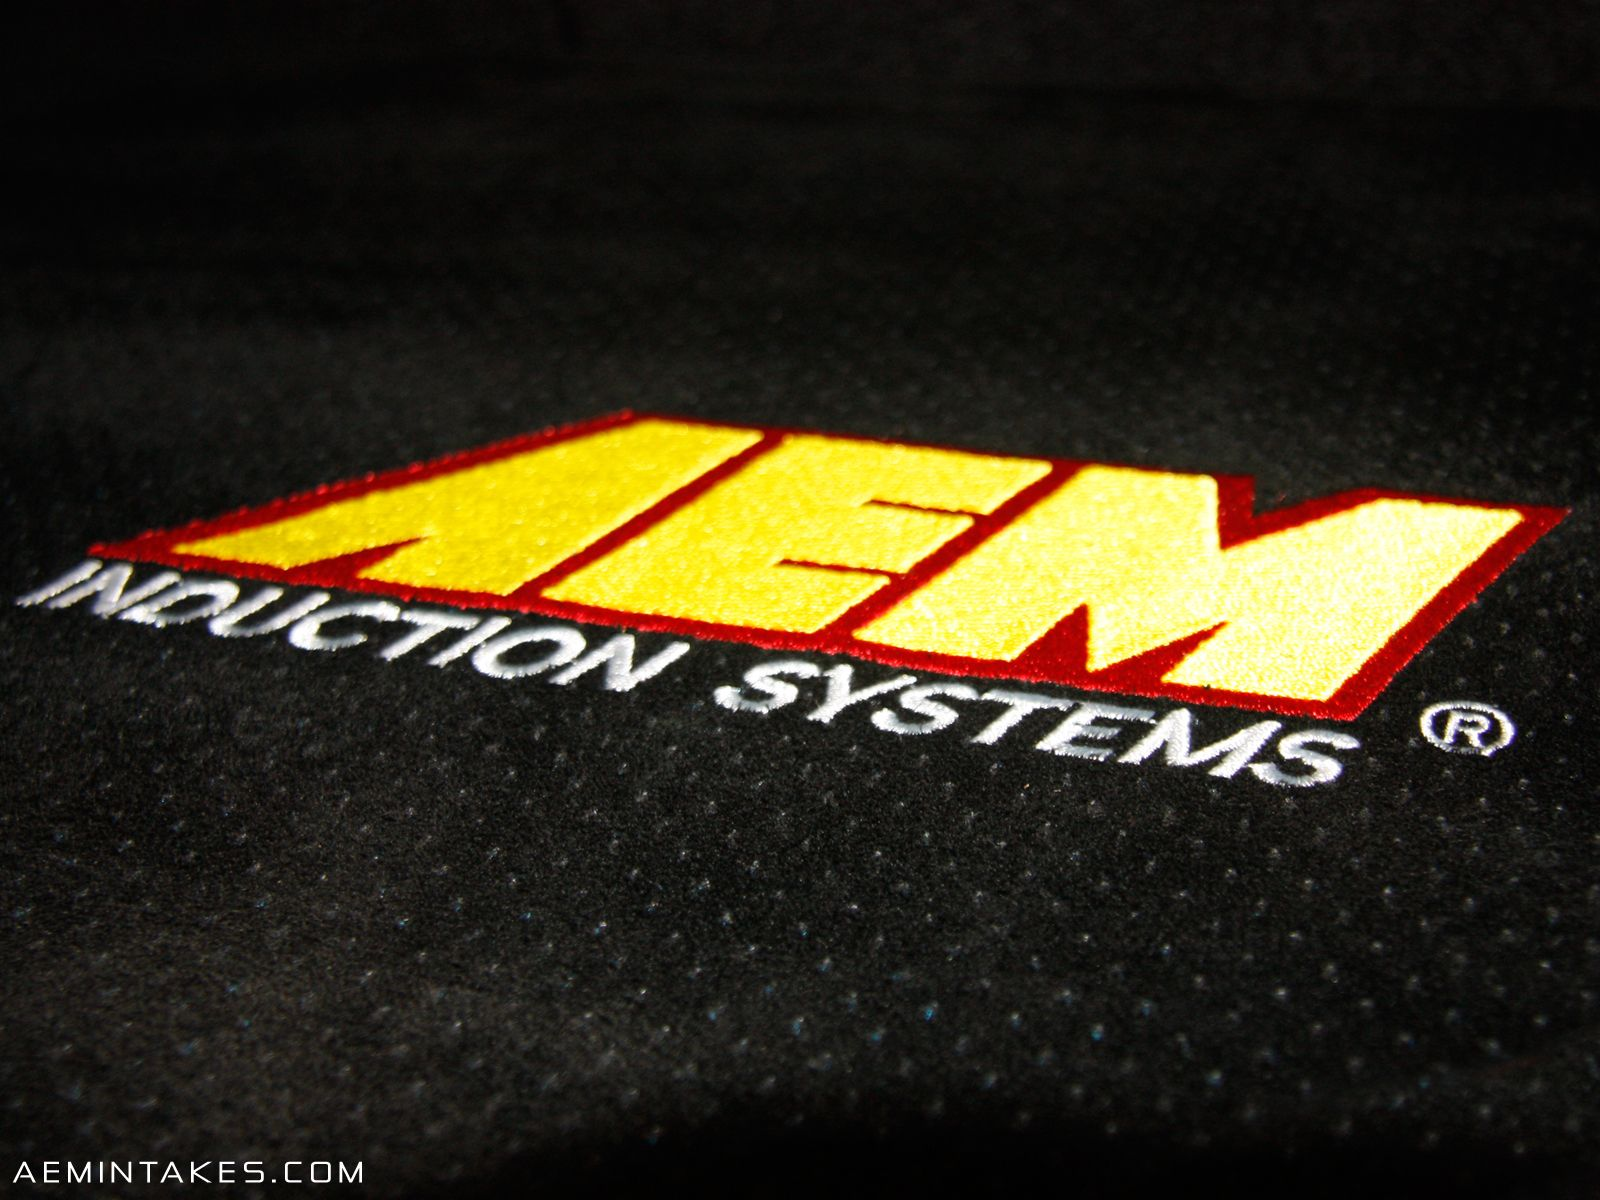 4 AEM STICKERS INTAKE  RACING DECALS